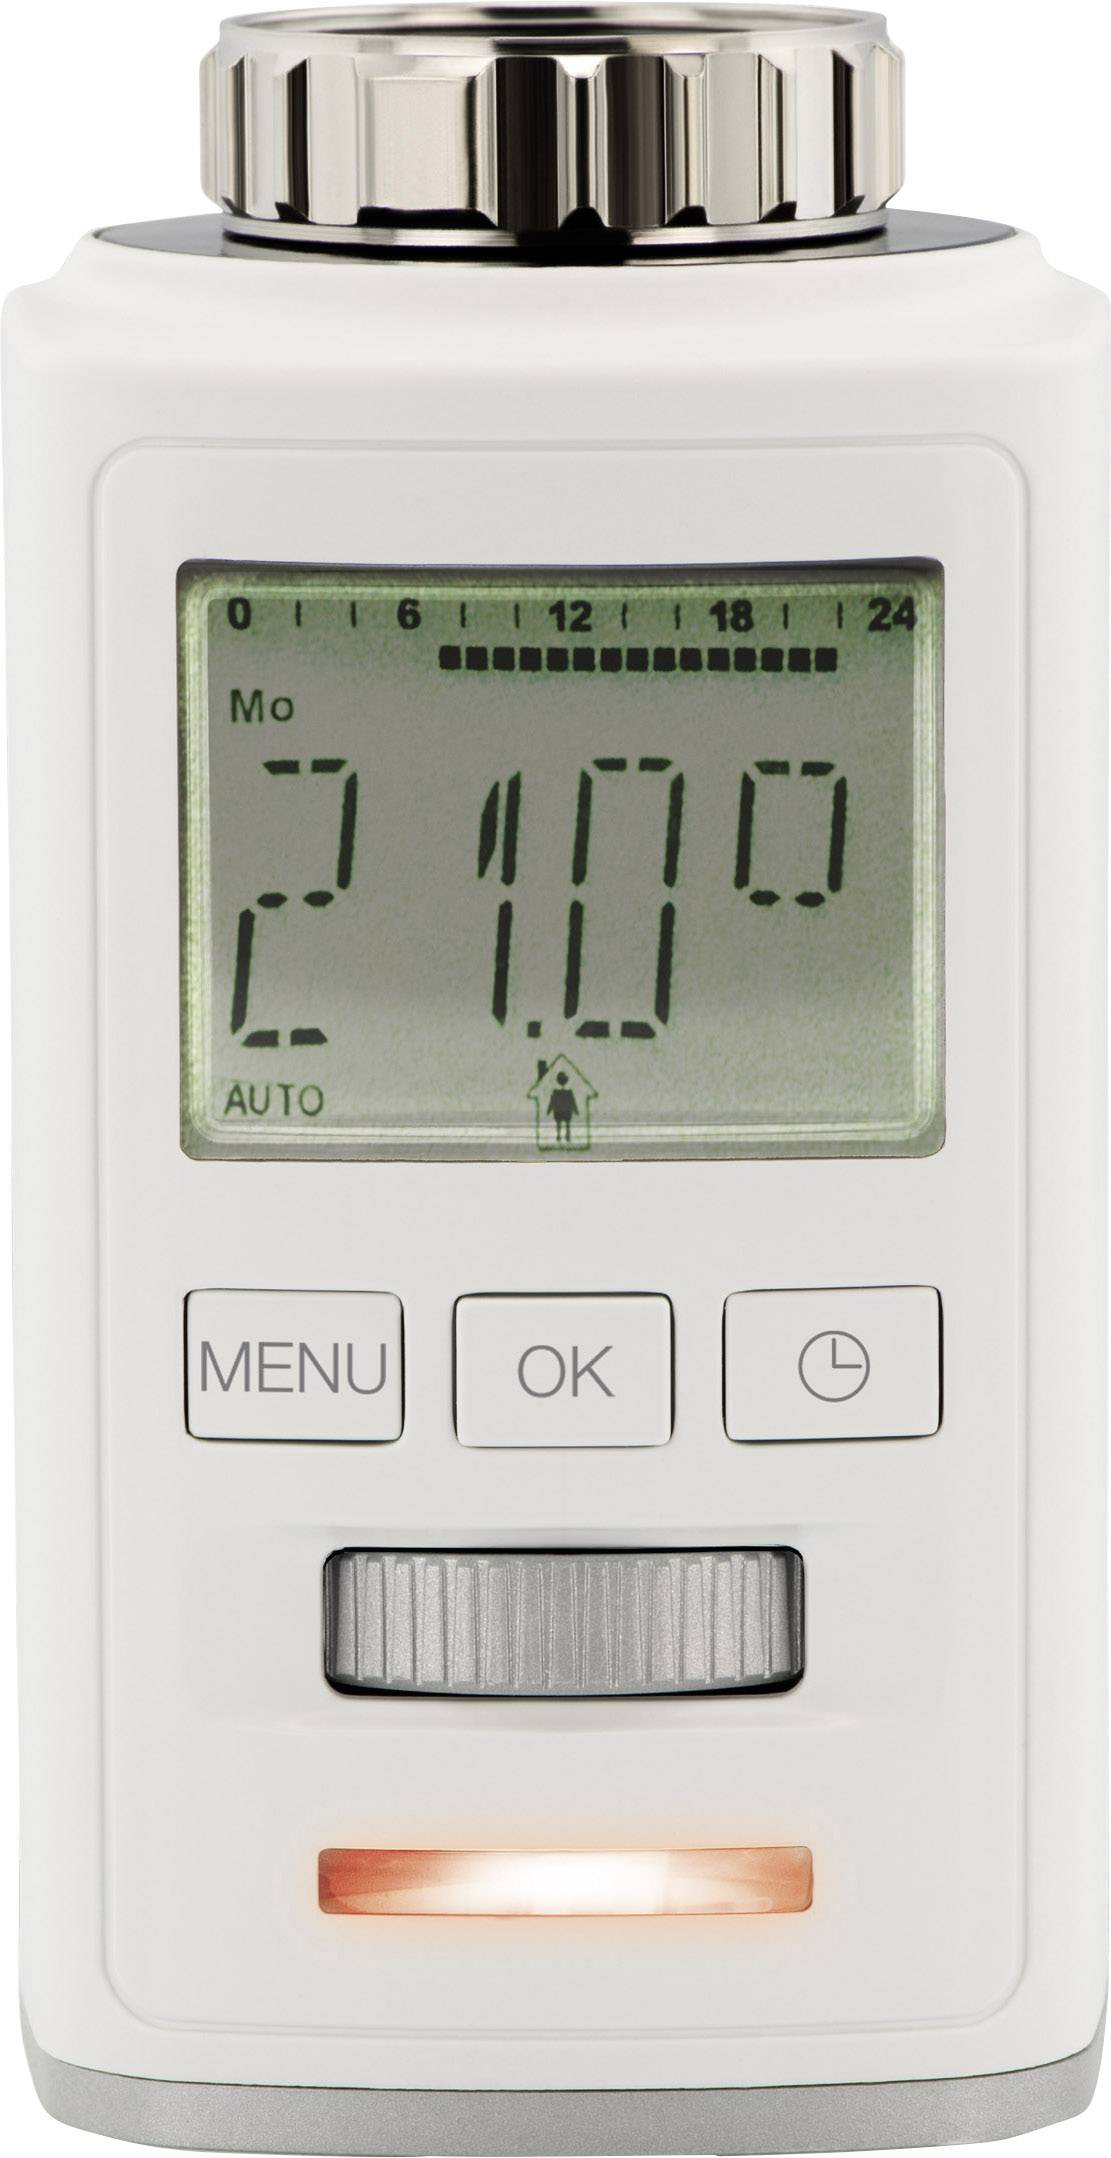 Bezdrôtová termostatatická hlavica na radiátor ovládaná cez smartfón Sygonix HT100 BT, Bluetooth 4.0